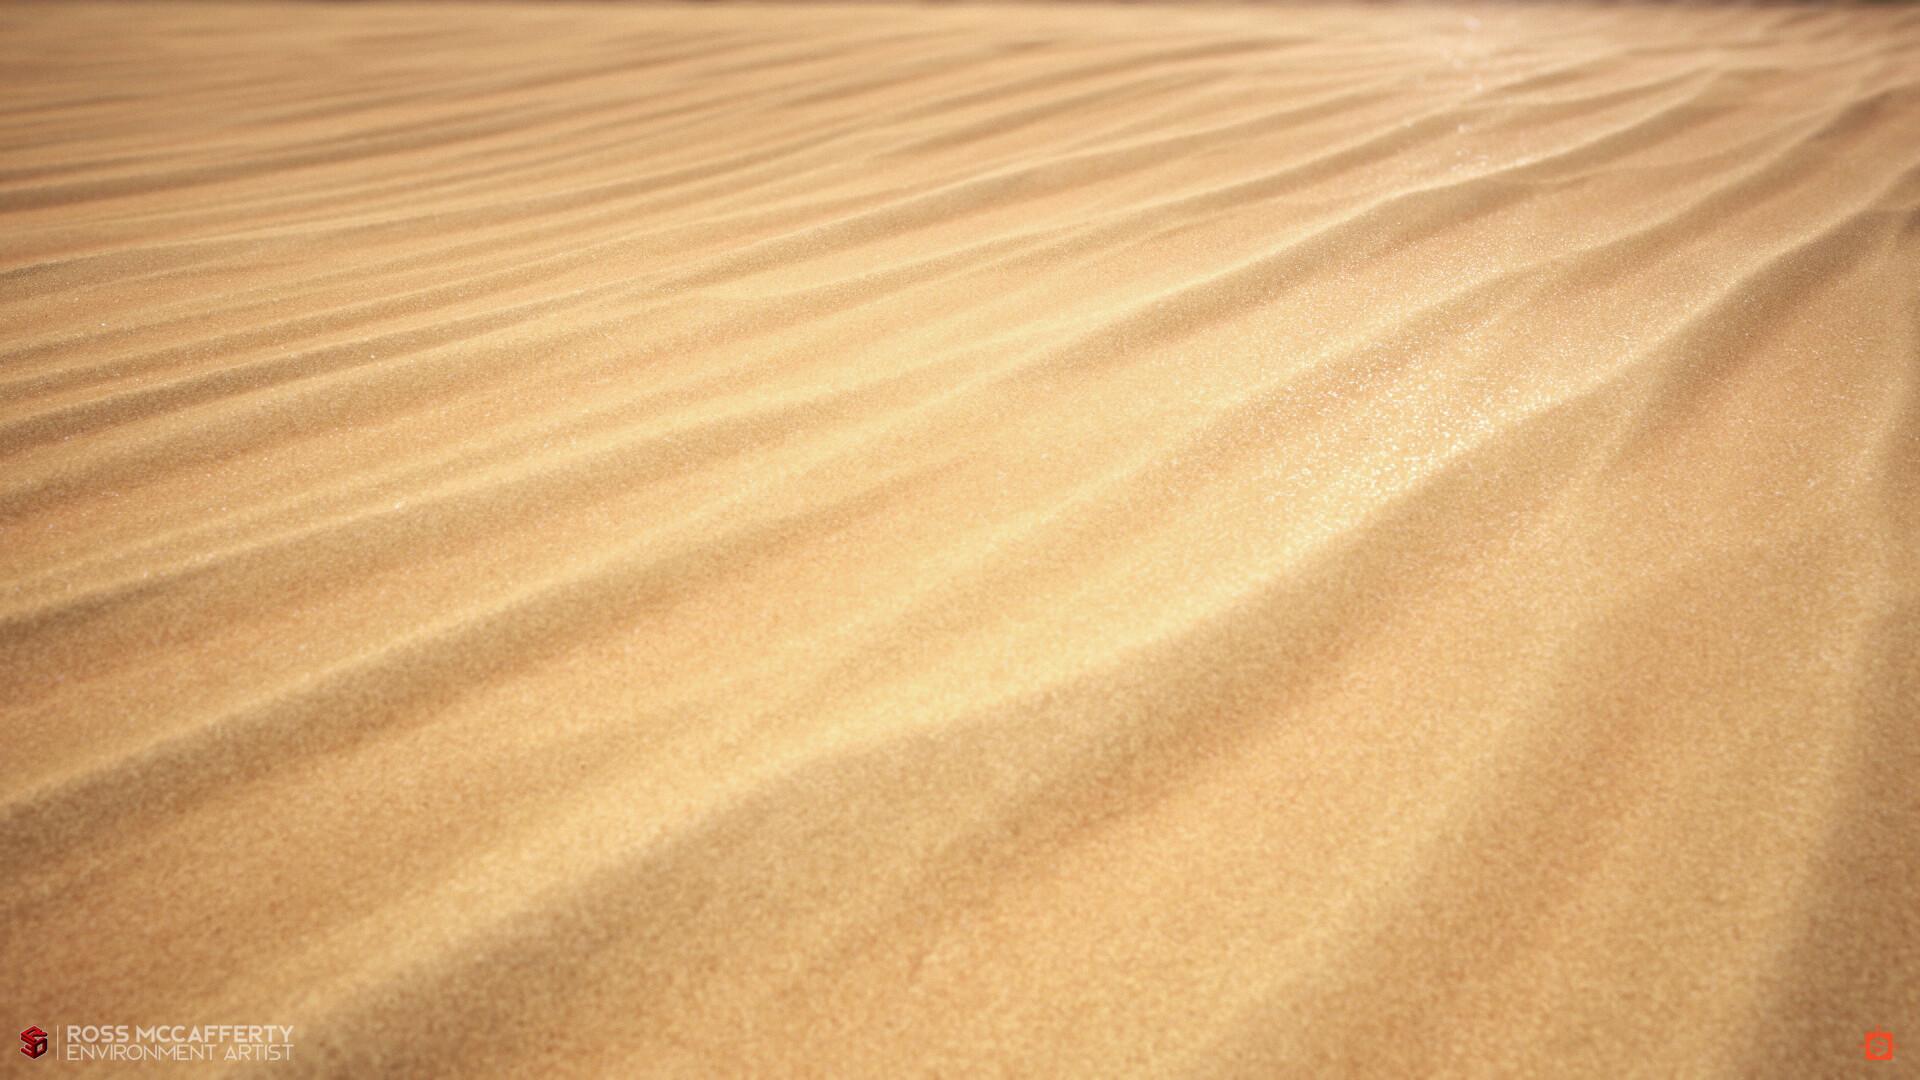 Ross mccafferty sand 01